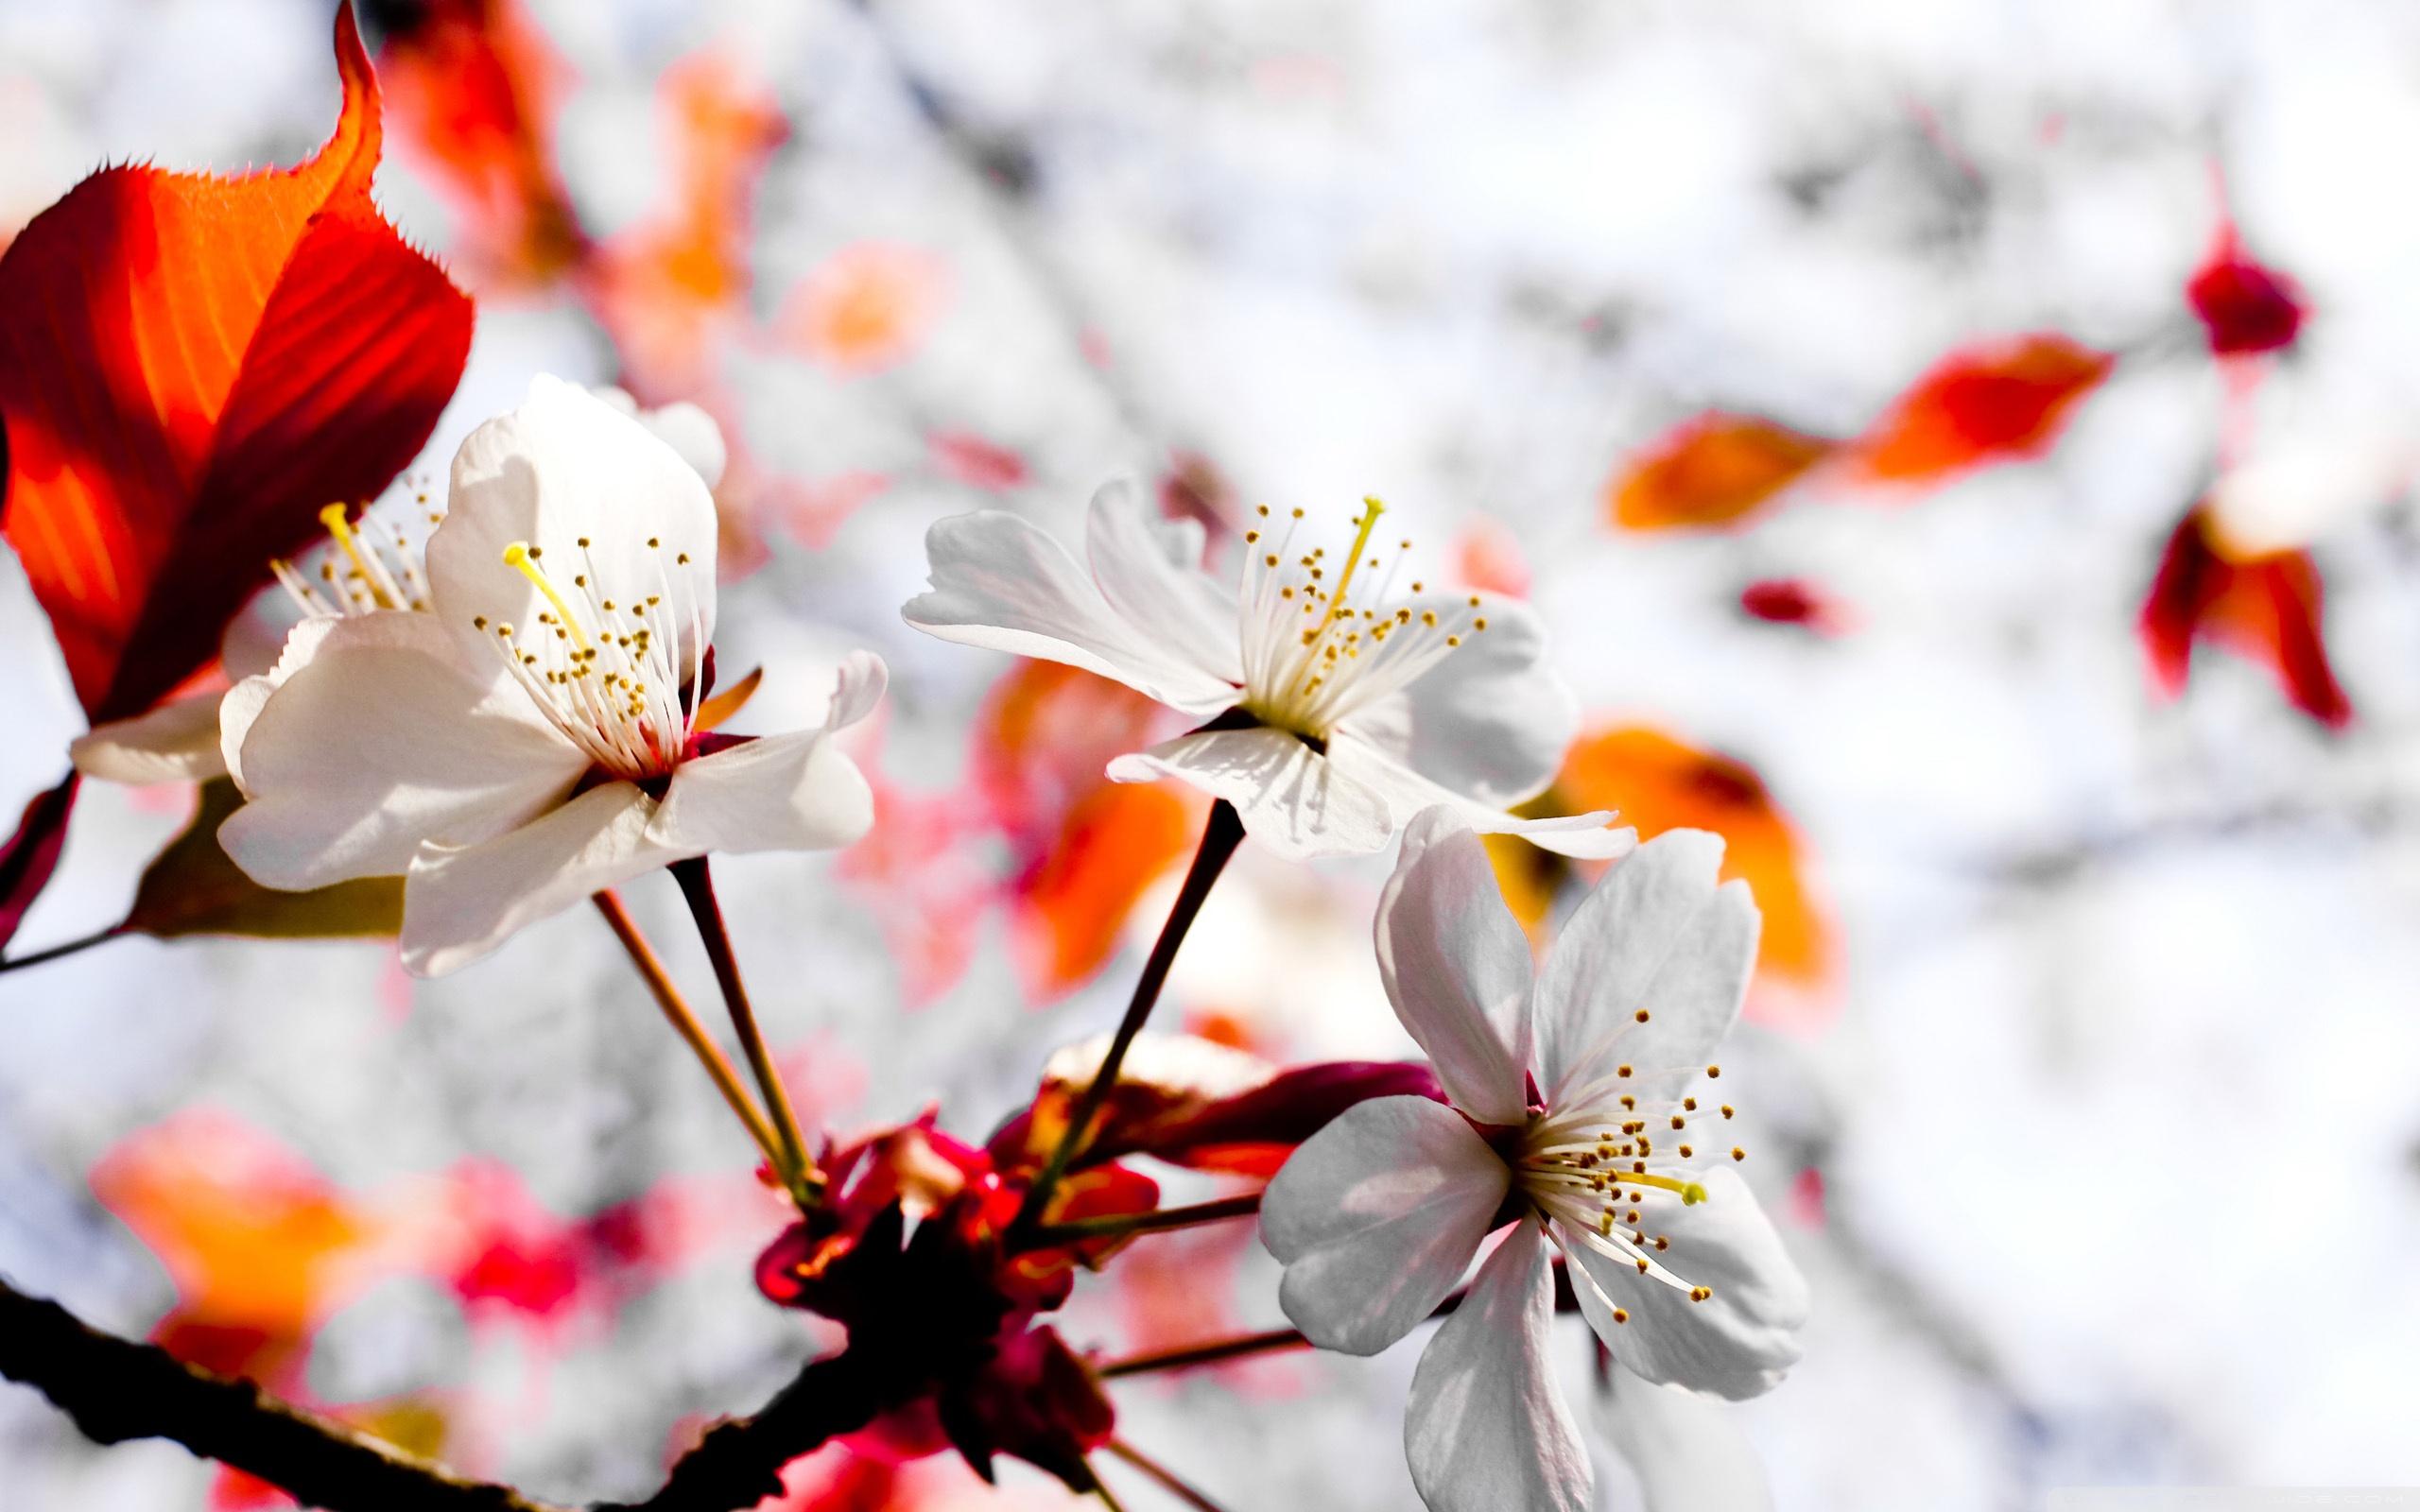 Spring Season Flowers Ultra HD Desktop Background Wallpaper for 4K 2560x1600